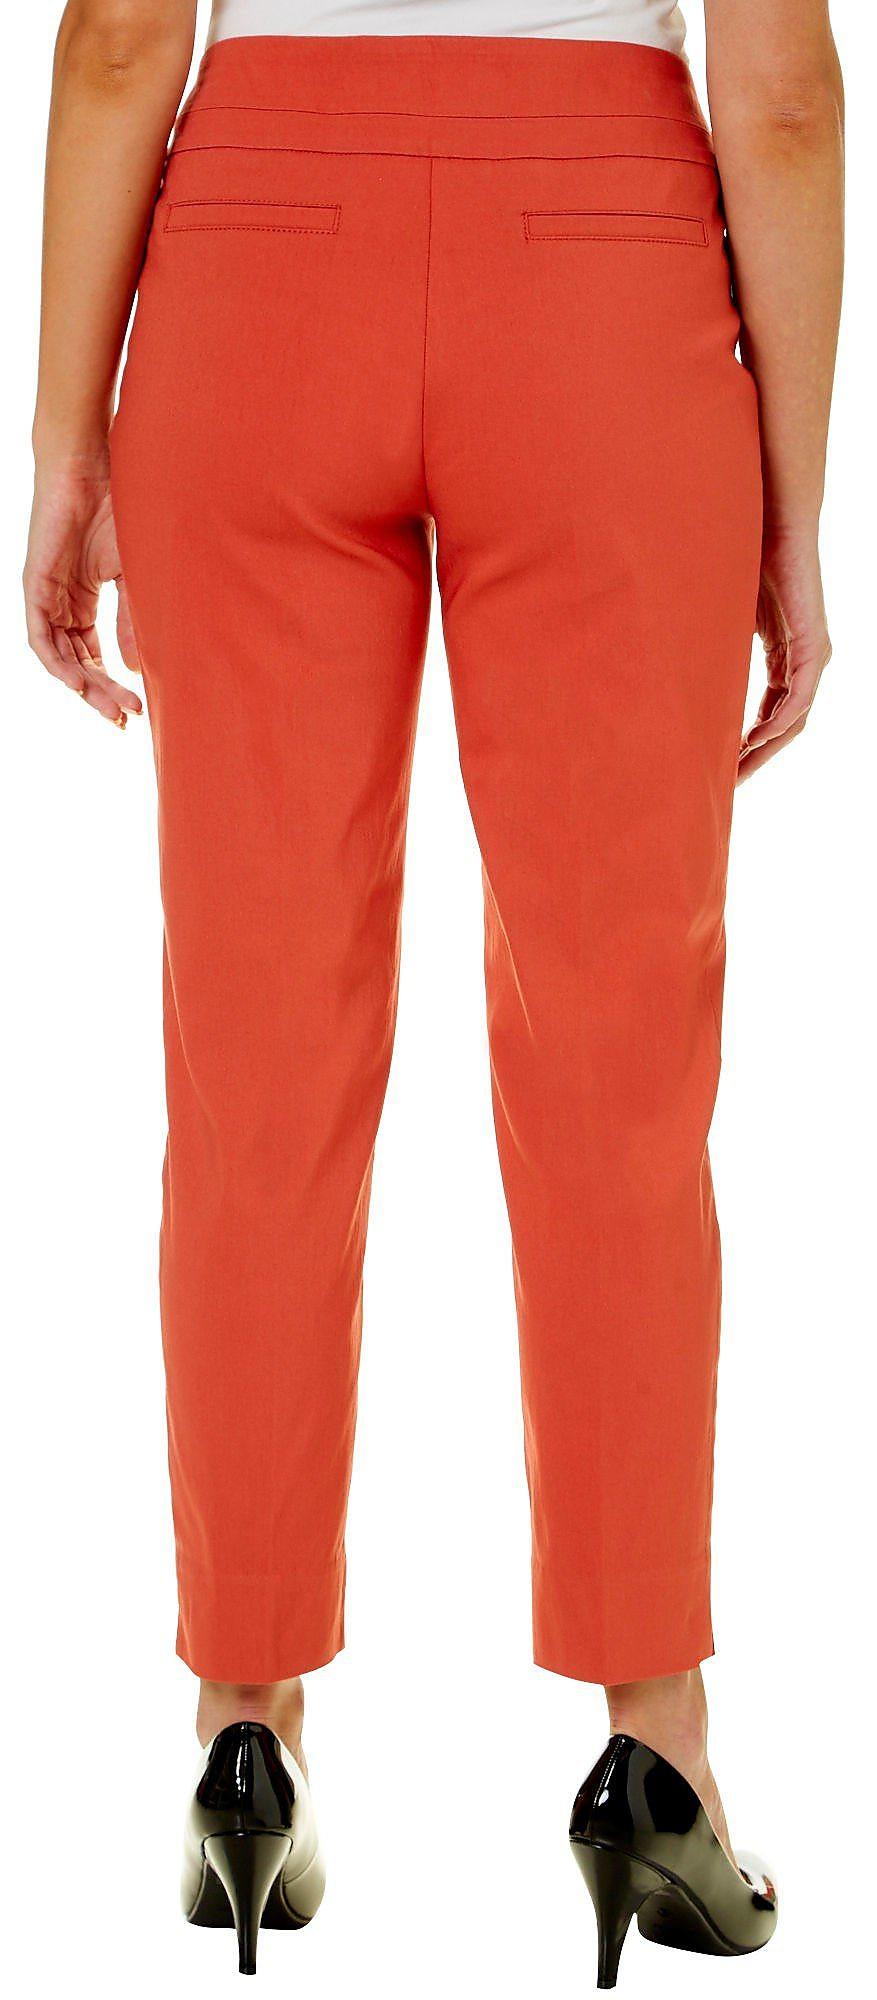 6347d93abc53f Zac   Rachel Womens Solid Pull On Millennium Pants